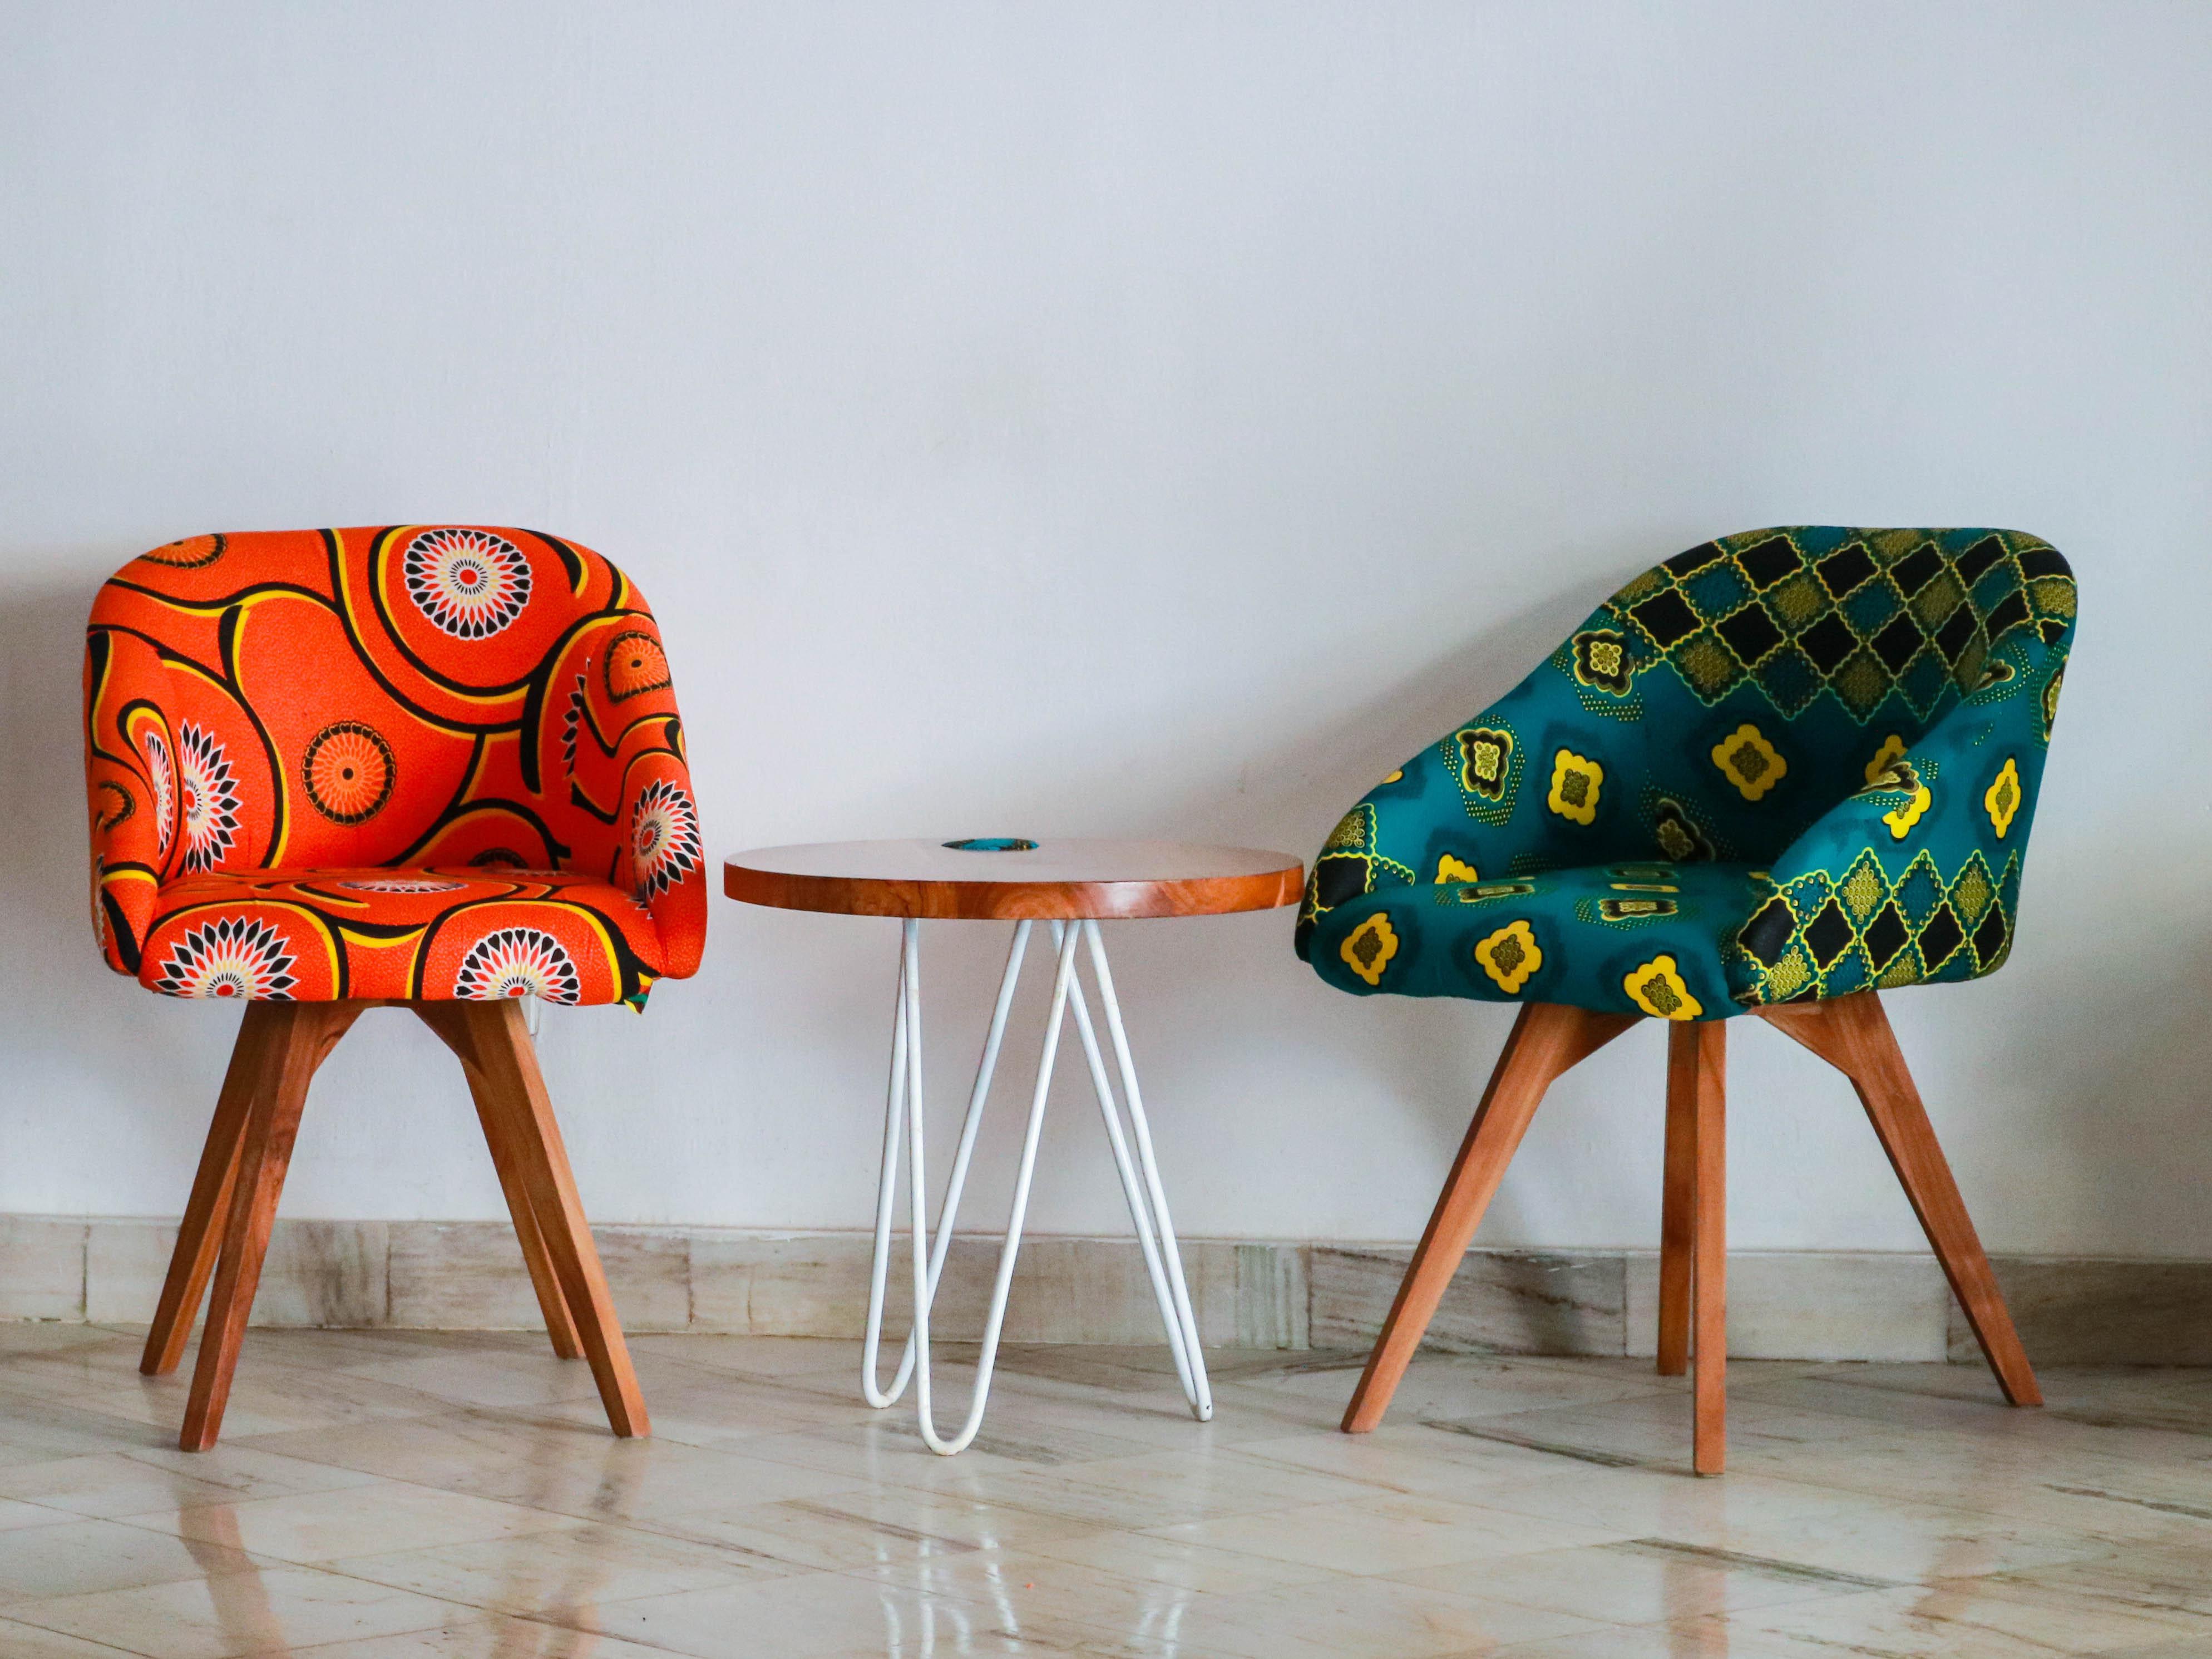 0218 Furniture jpg?height=635&t=1613624501&width=1200.